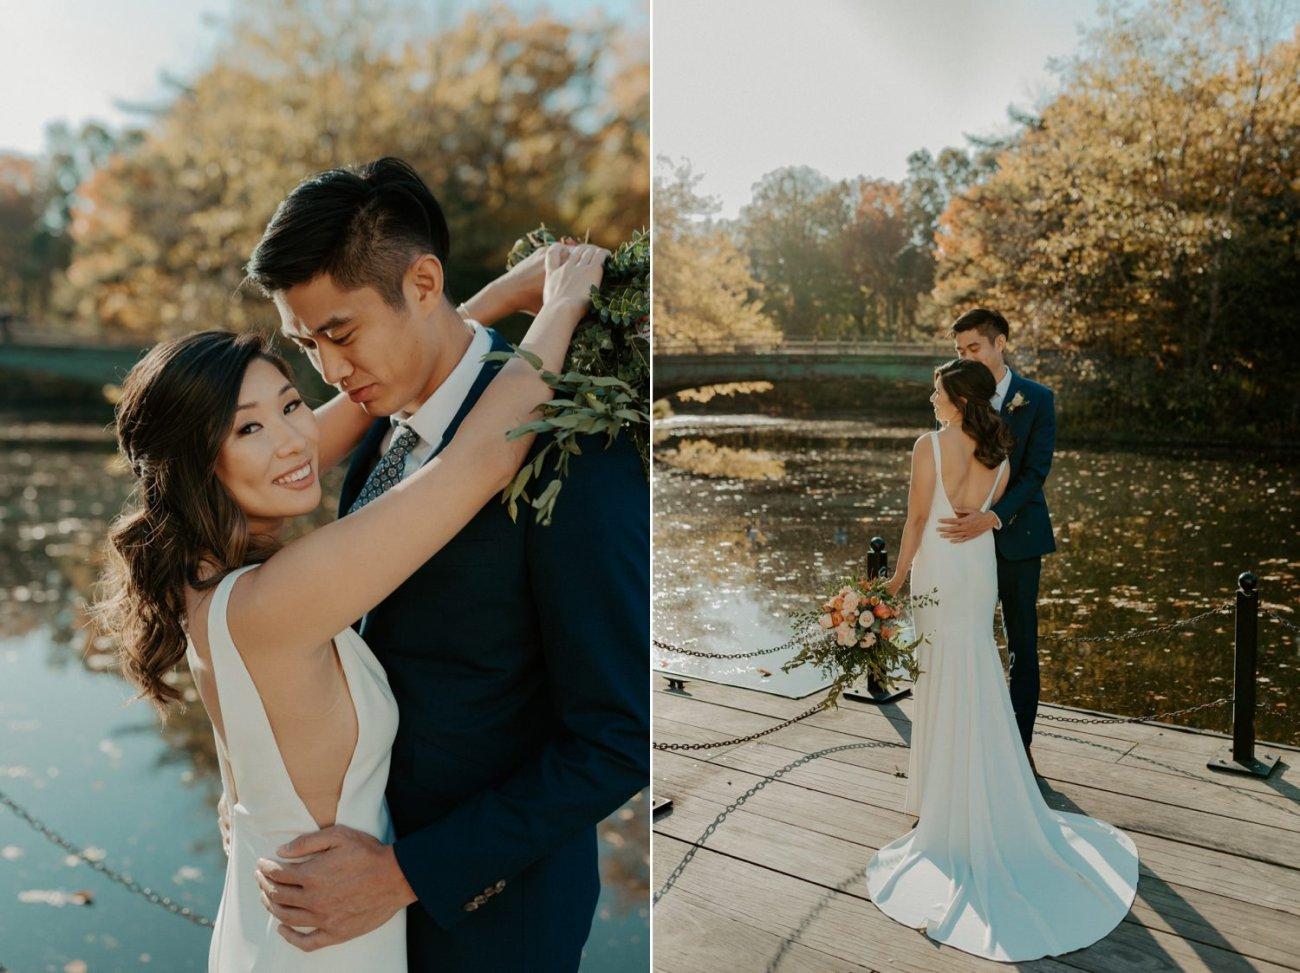 Prospect Park Brooklyn Wedding Fall Wedding In NYC New York Wedding Photographer Anais Possamai Photography 03